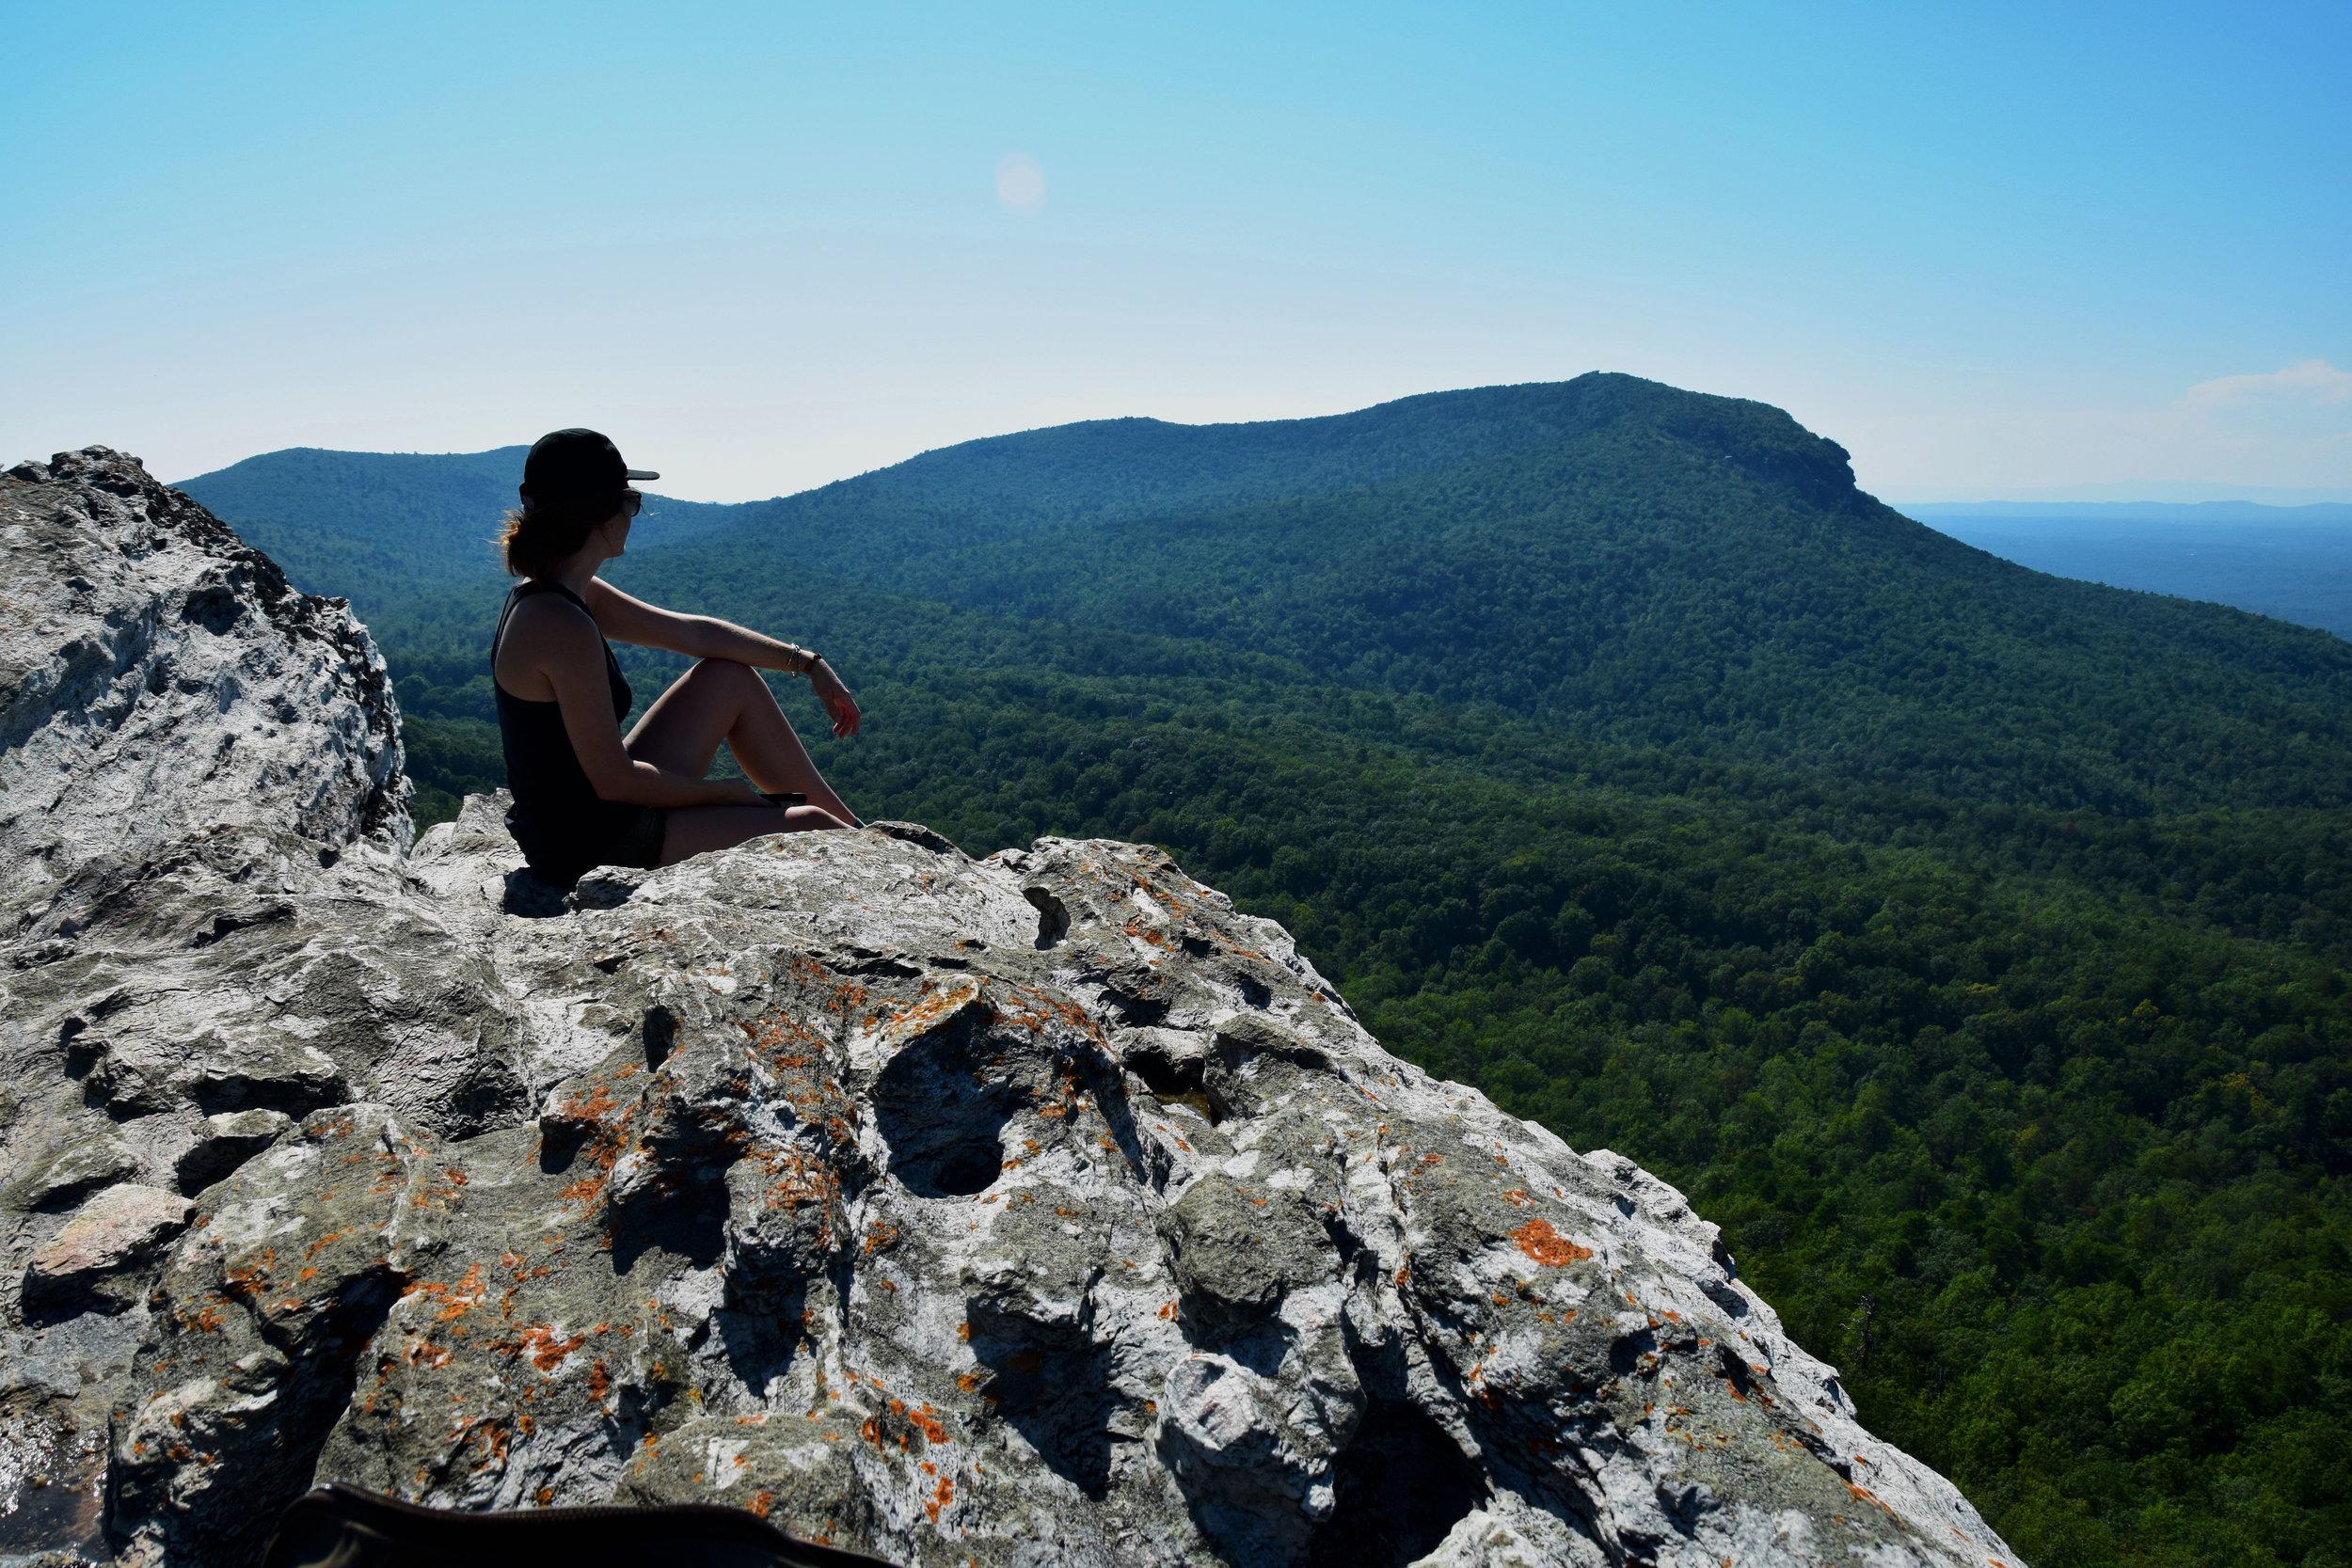 Hanging Rock State Park (Overlook)